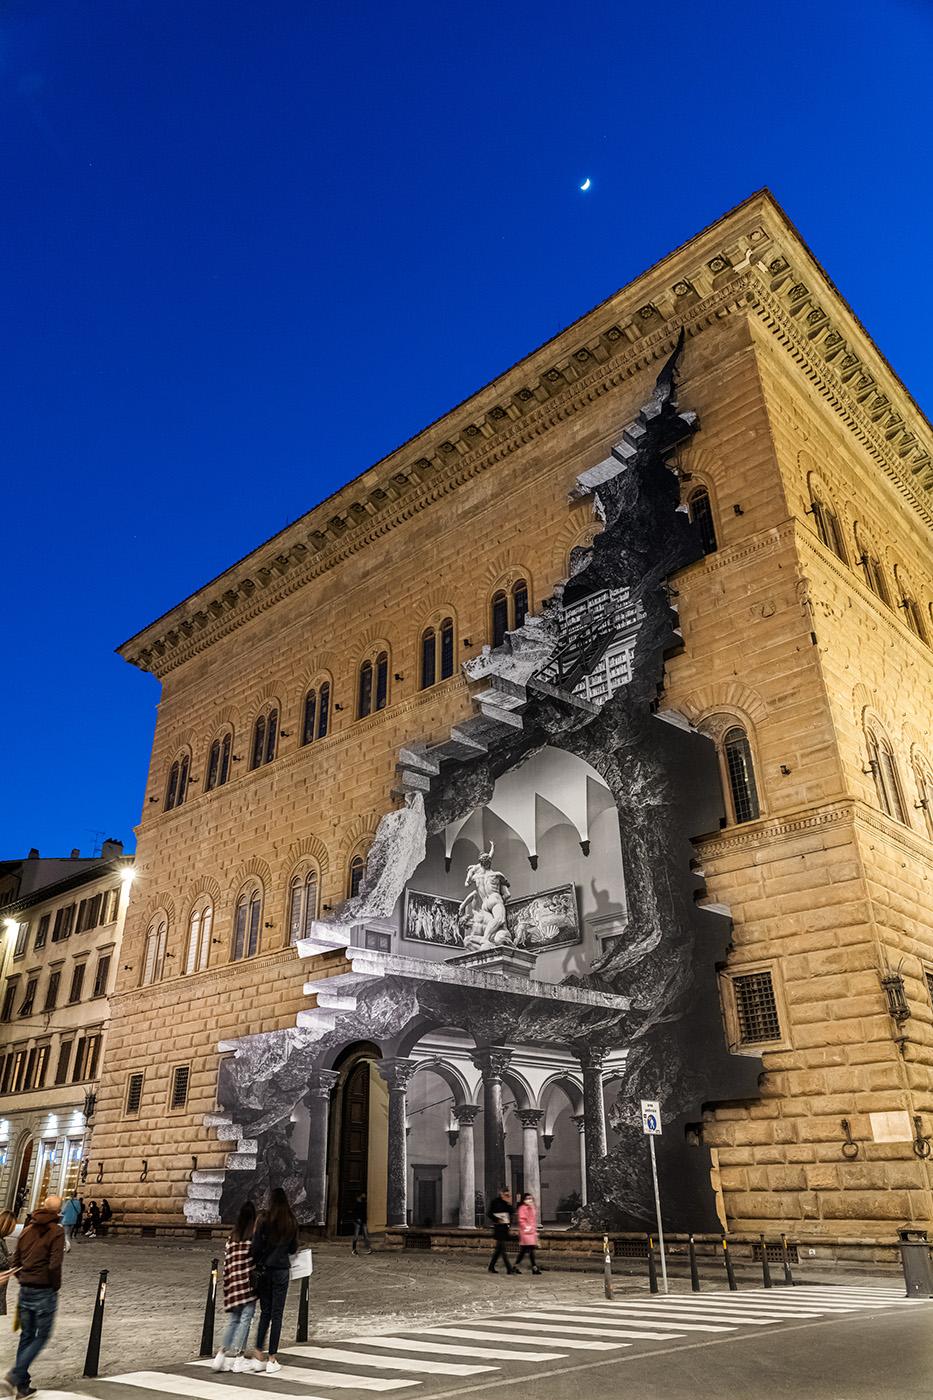 JR La Ferita Palazzo Strozzi Firenze